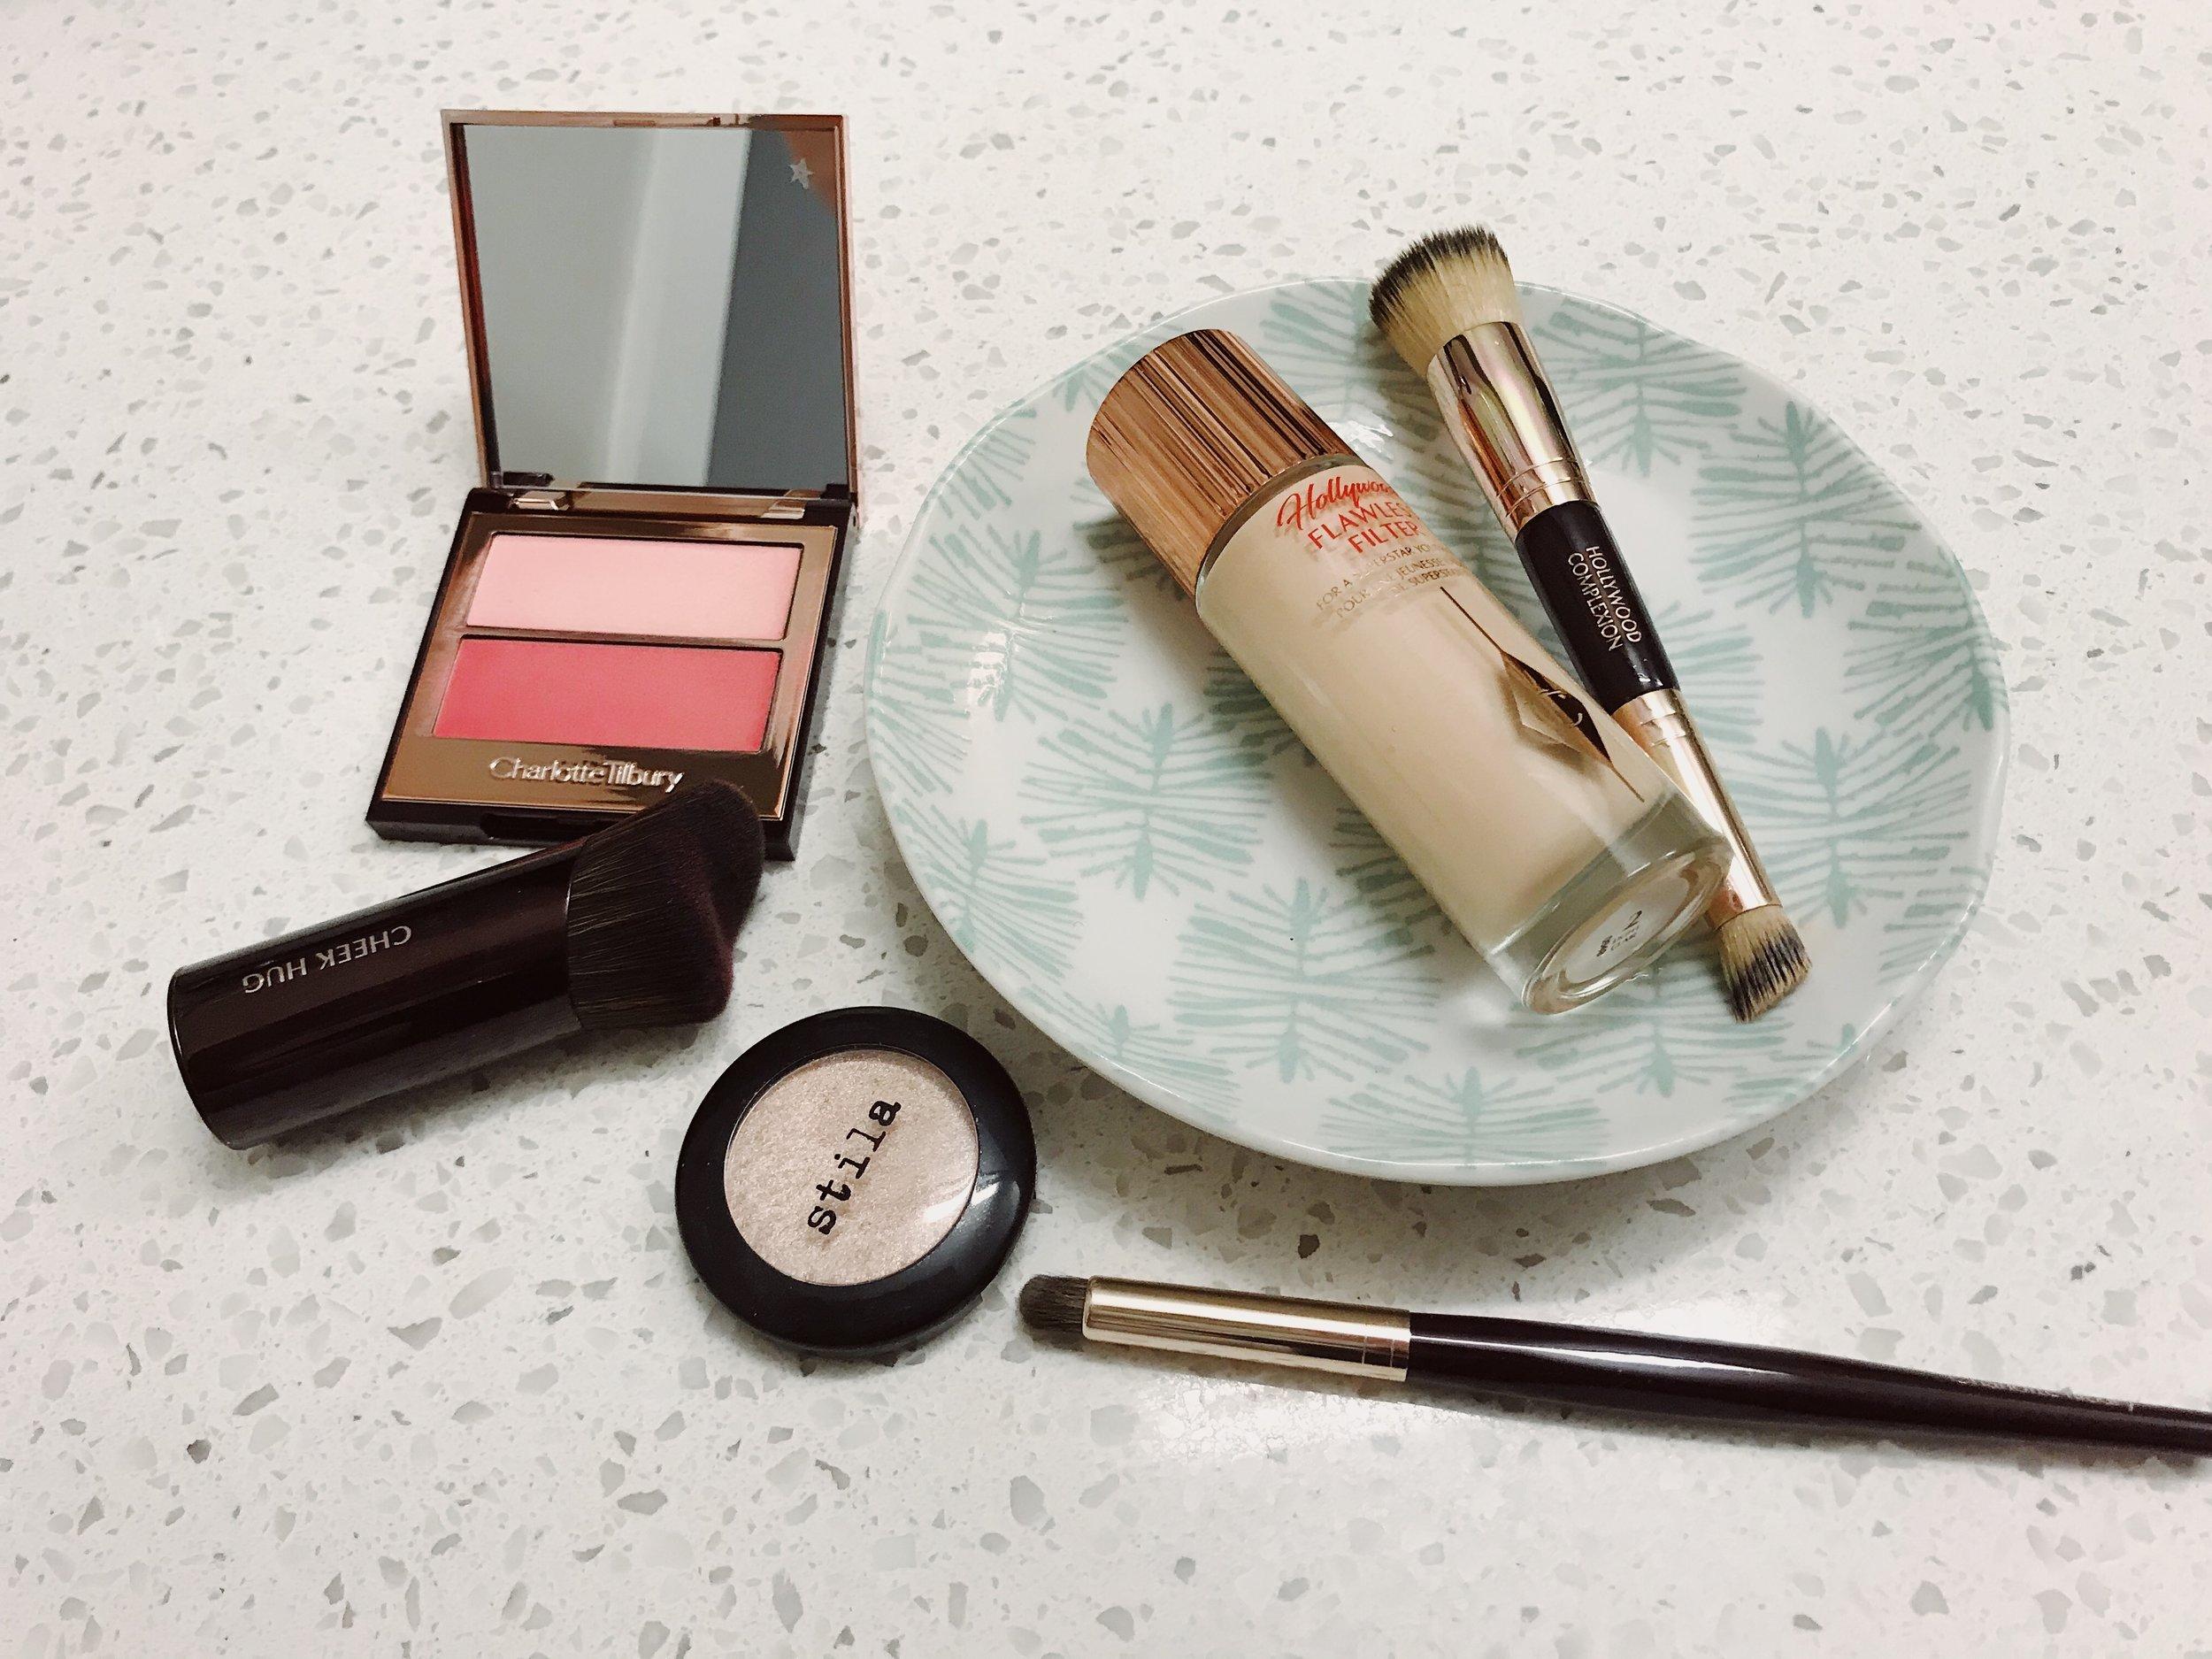 Charlotte Tilbury Makeup Brush